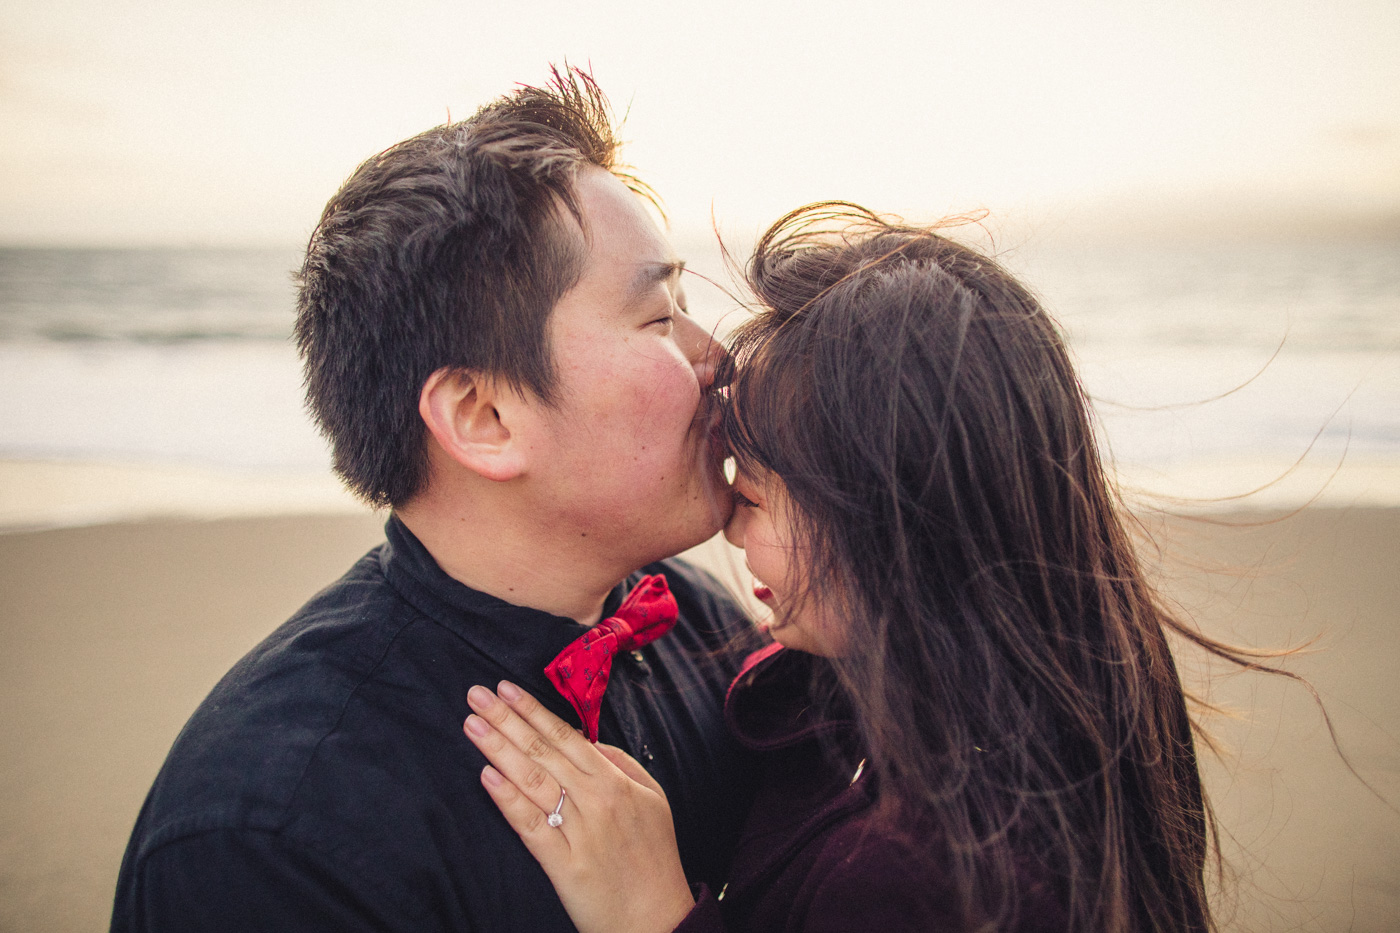 aaron-kes-photography-sweet-forehead-kiss